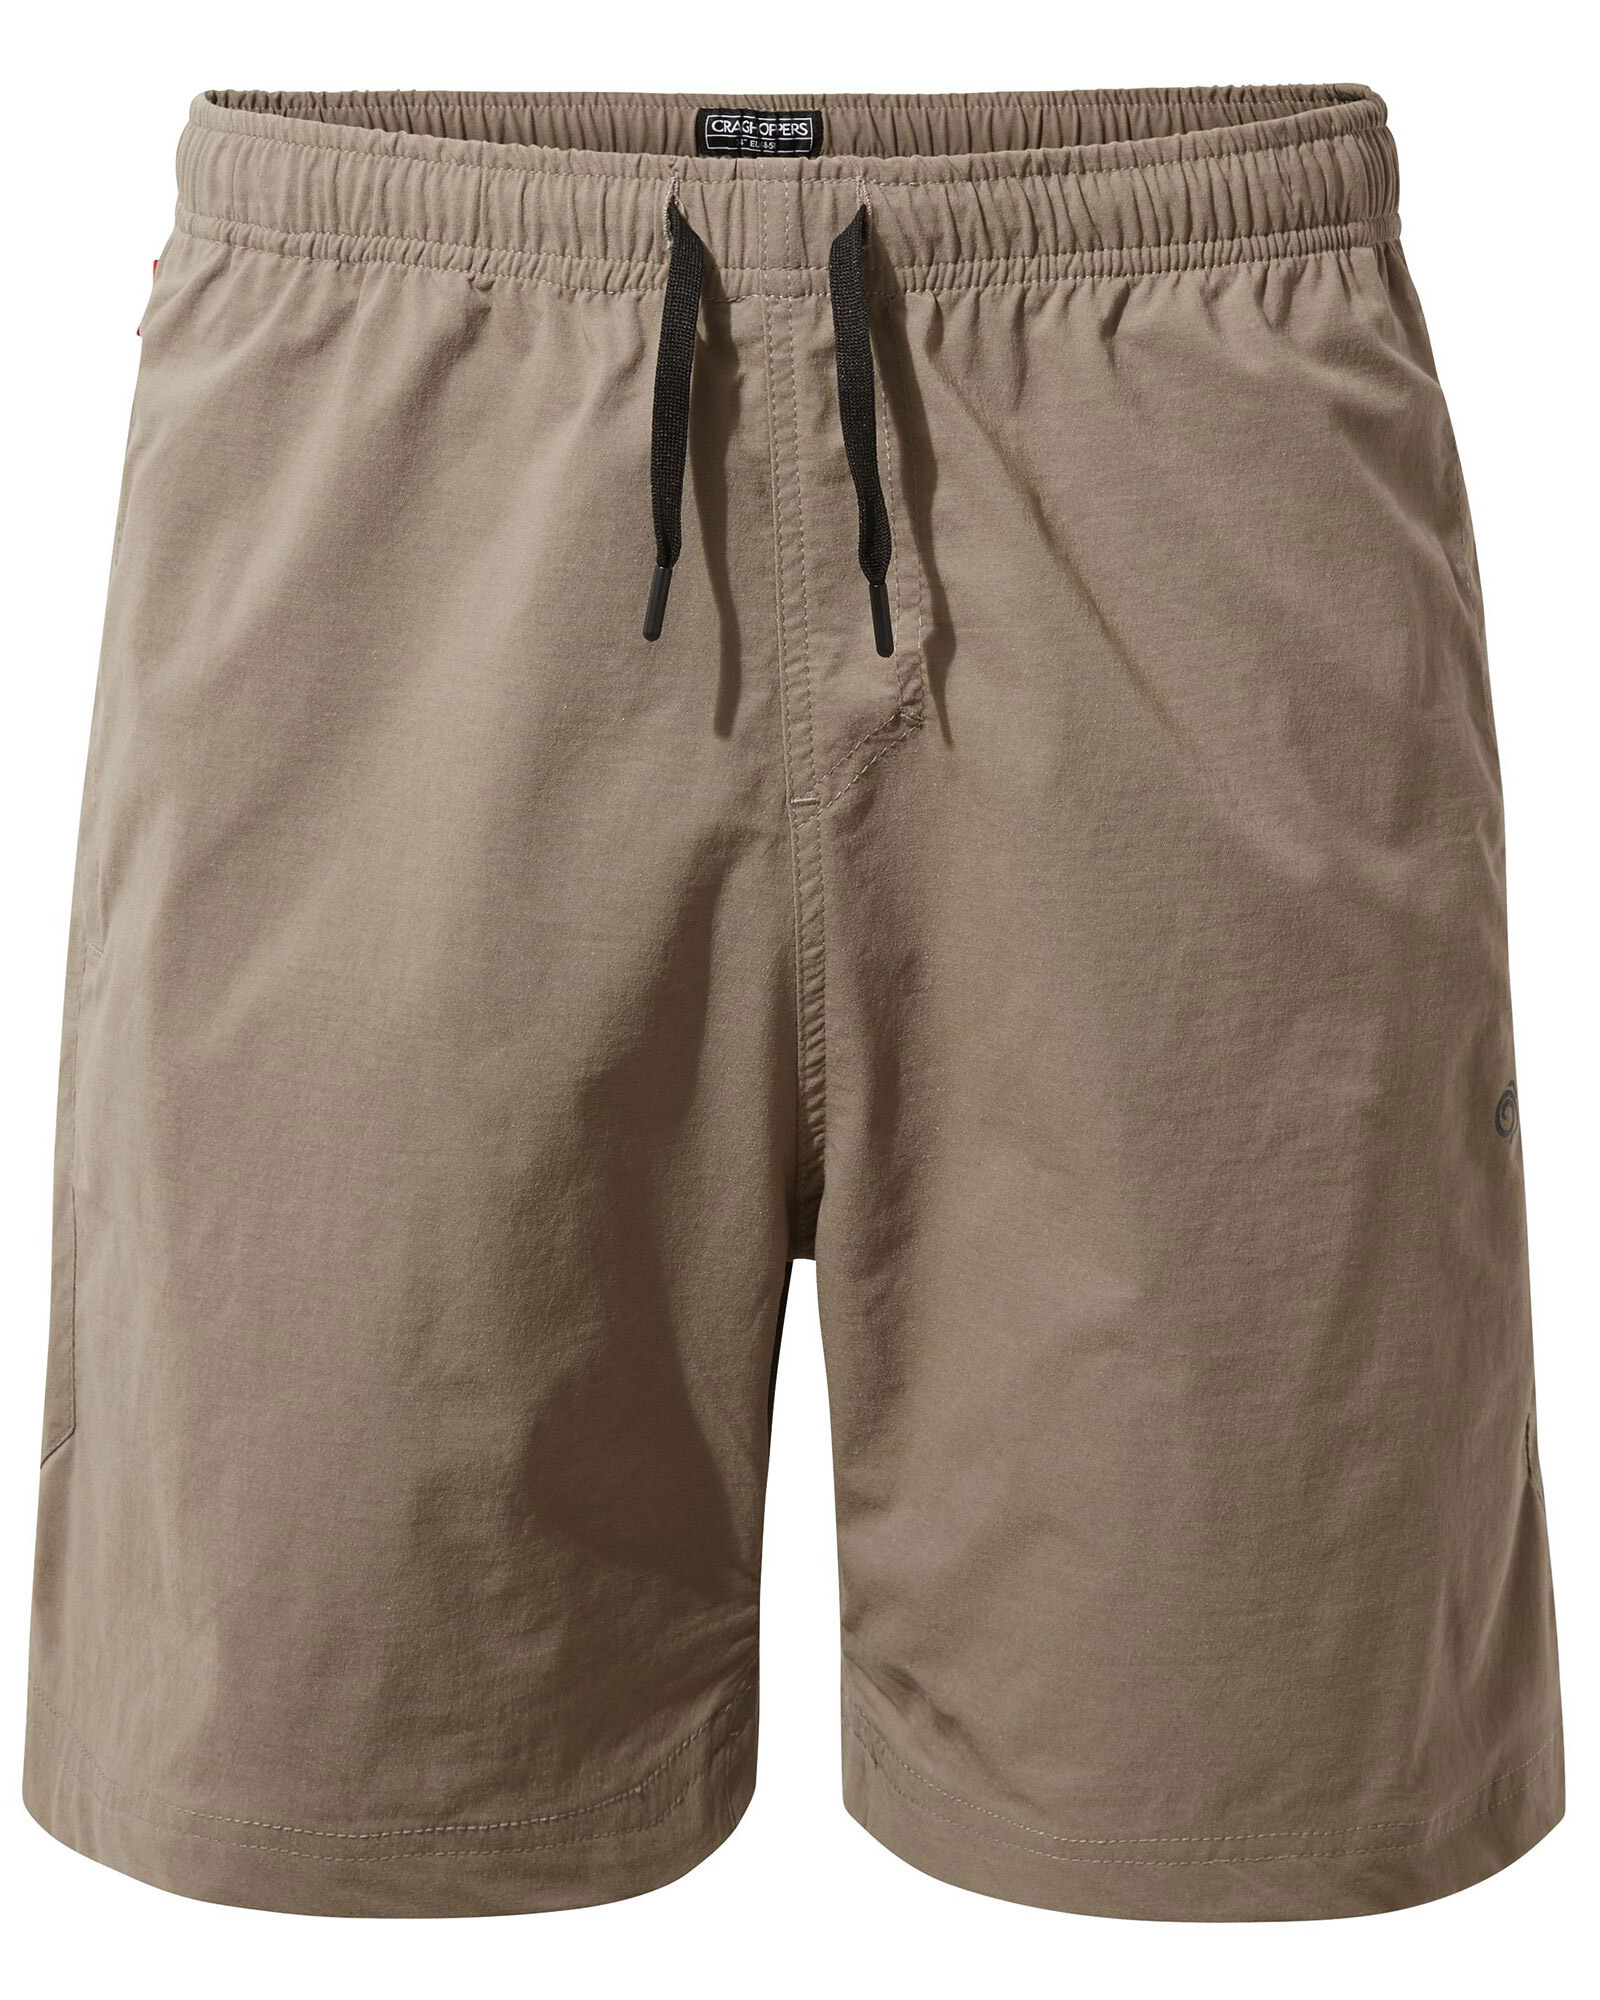 Craghoppers Men's NosiLife Antonio Shorts 0